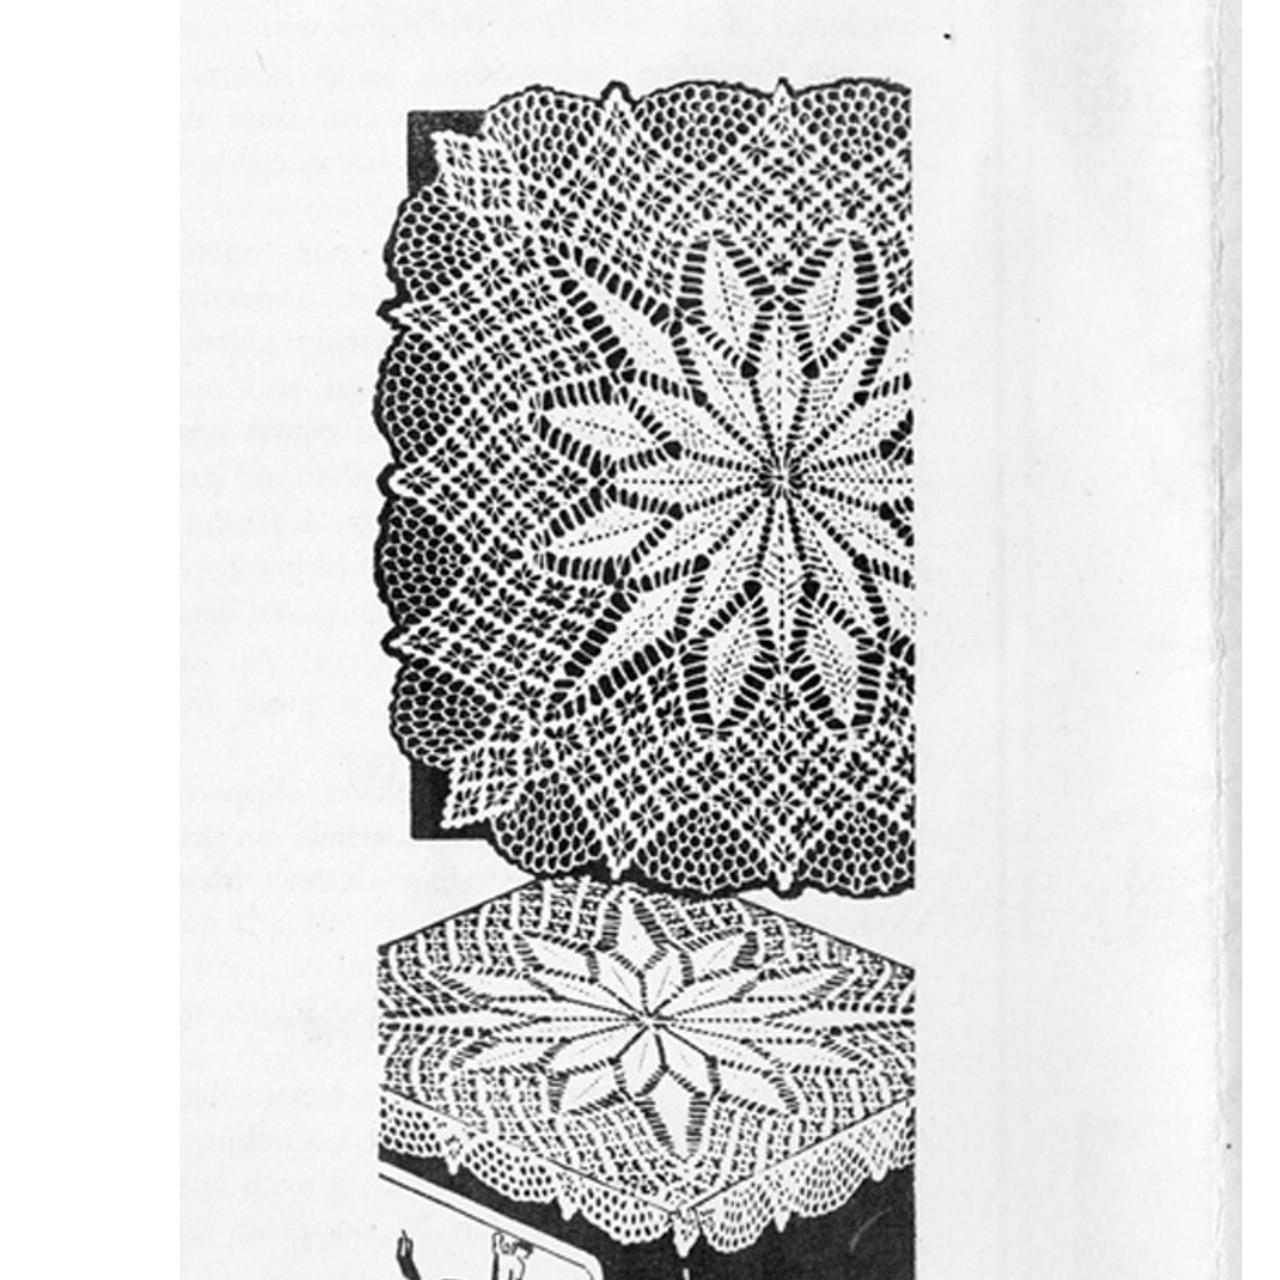 Flower Crocheted Centerpiece Doily pattern